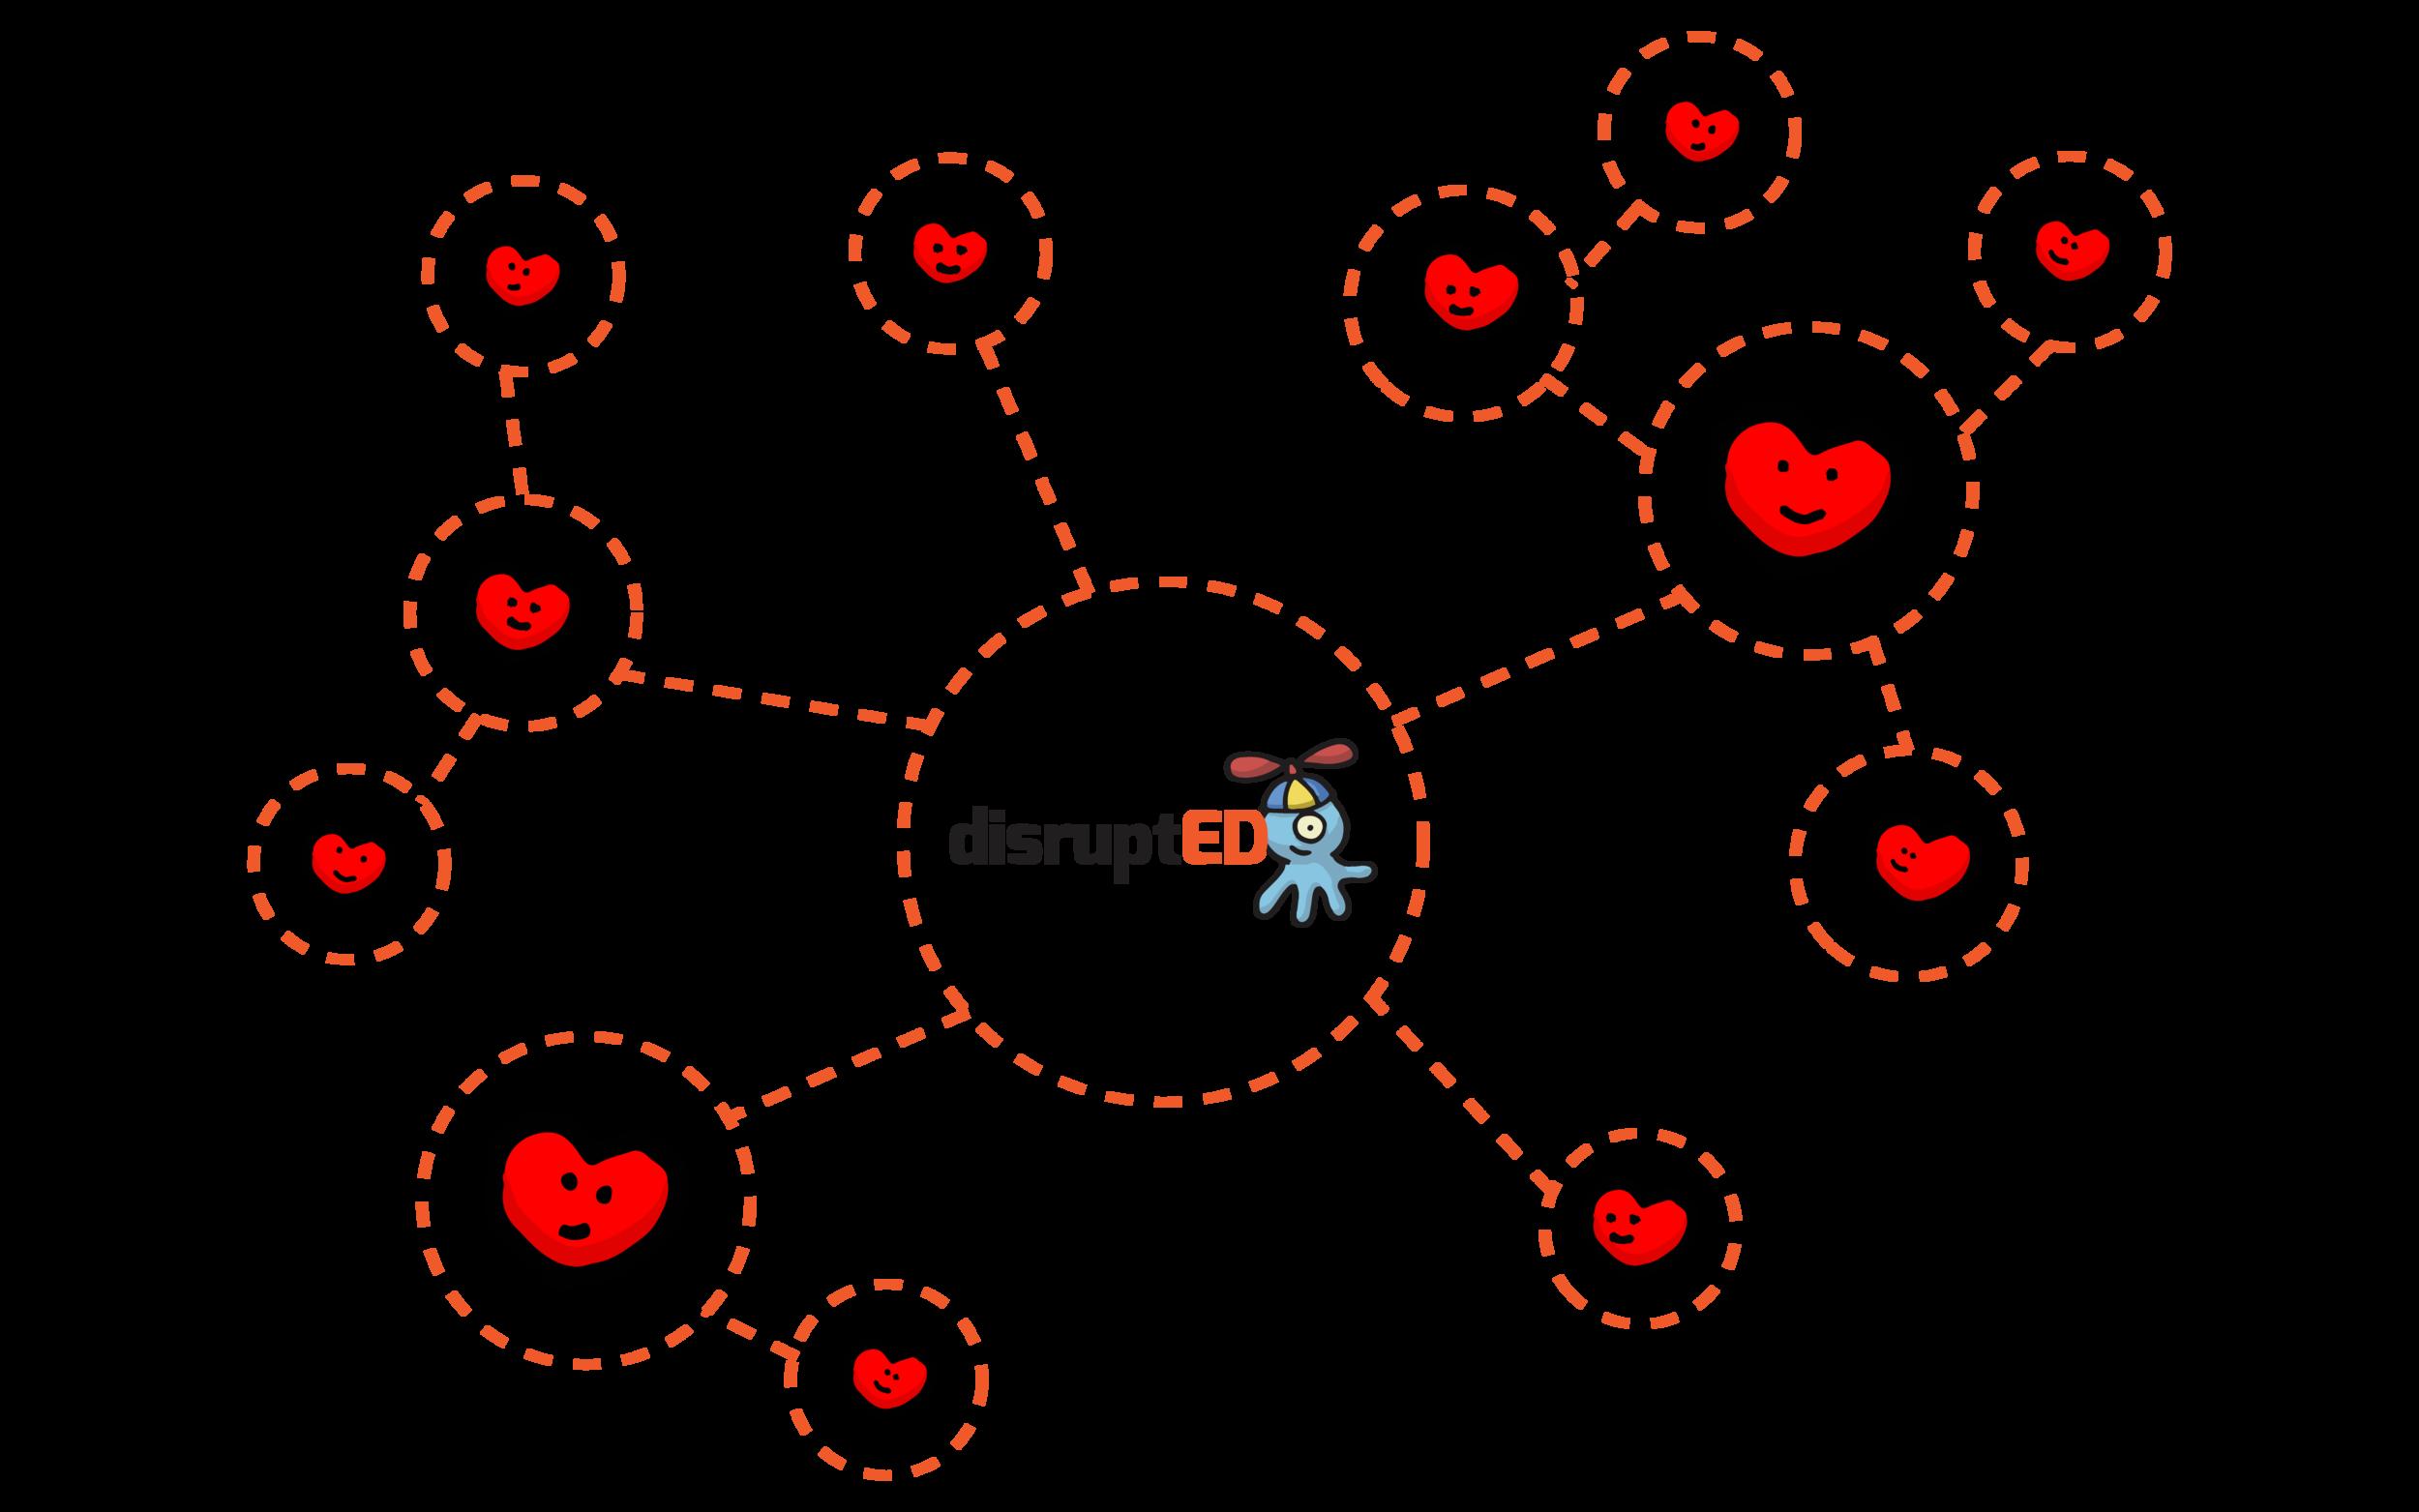 disruptED_donateED_chart2_V2.png